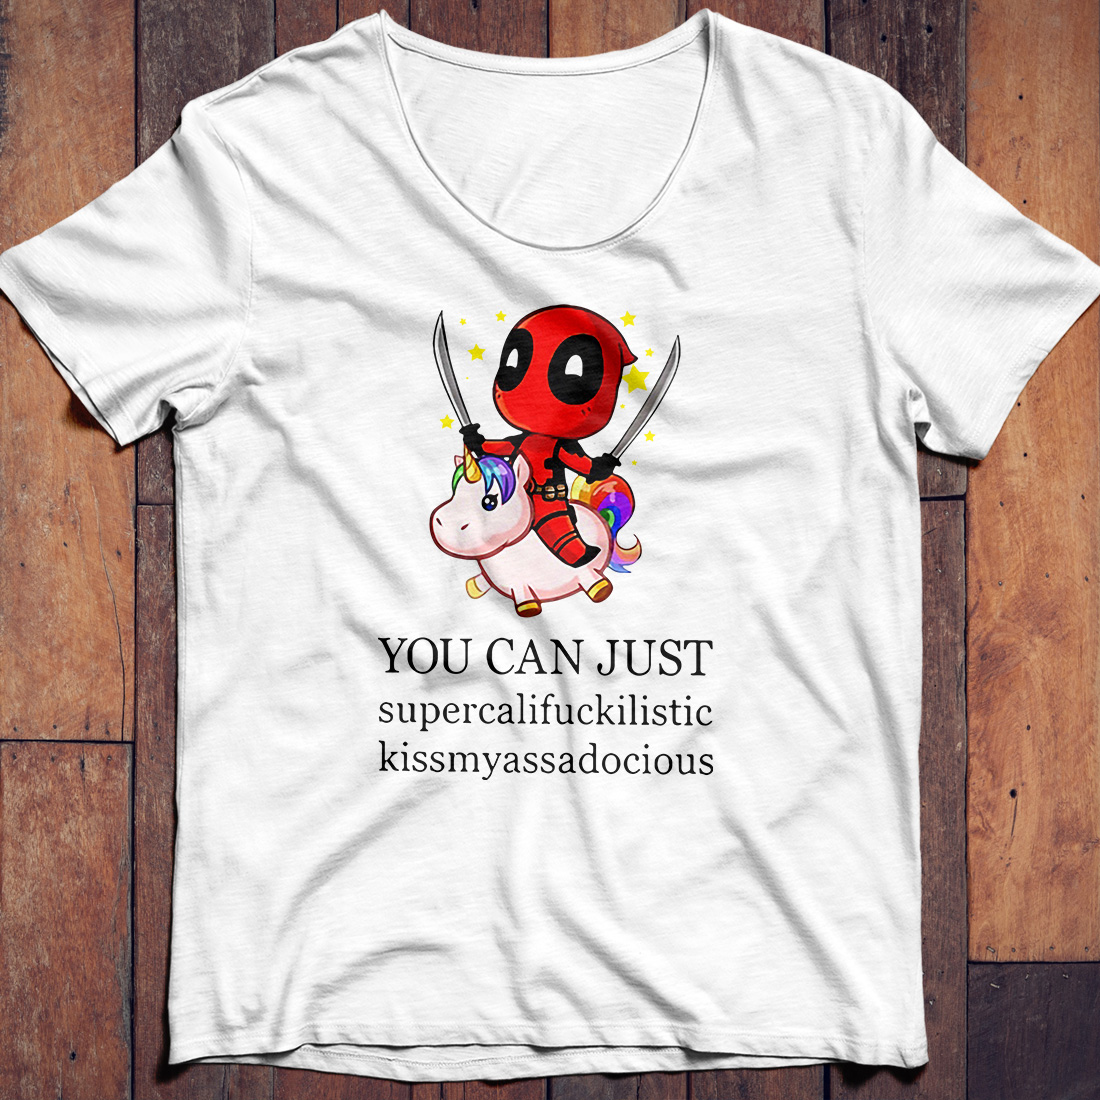 Deadpool riding unicorn you can just supercalifuckilistic kissmyassadocious shirt